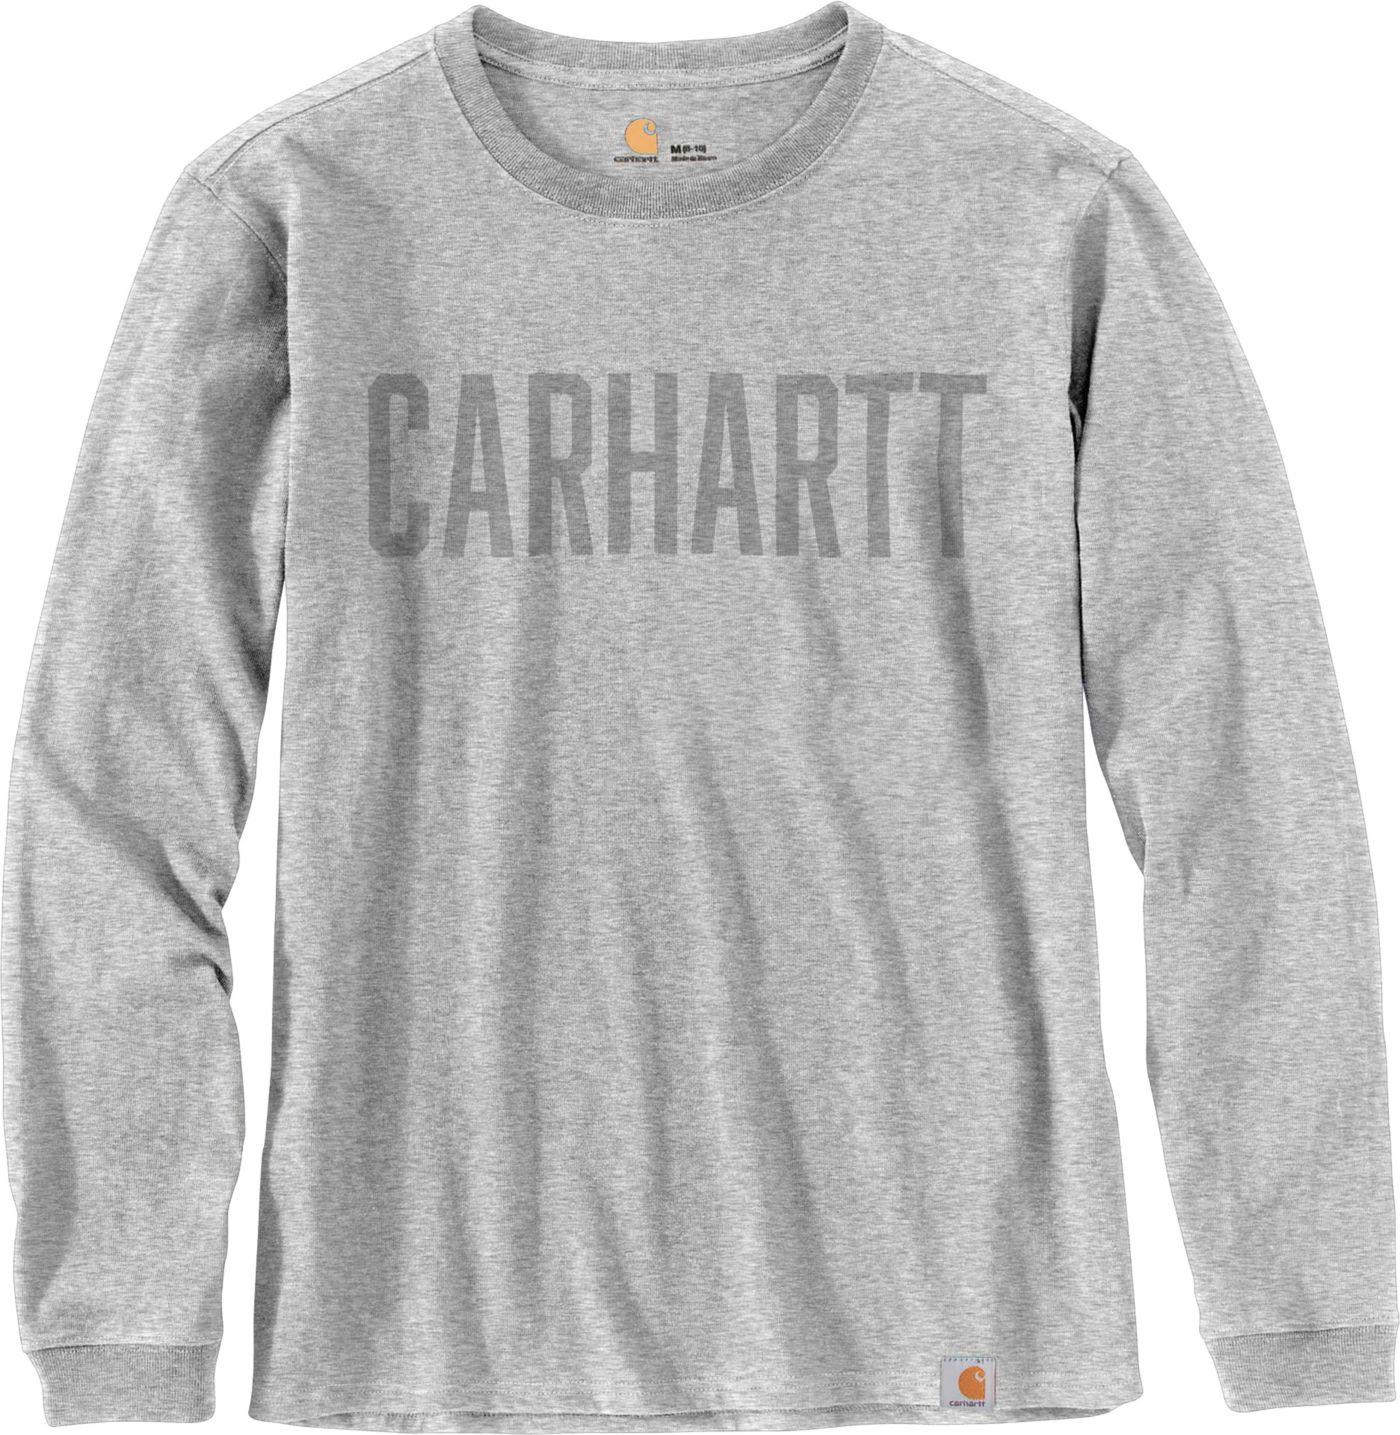 Carhartt Men's Workwear Block Logo Graphic Long Sleeve T-Shirt